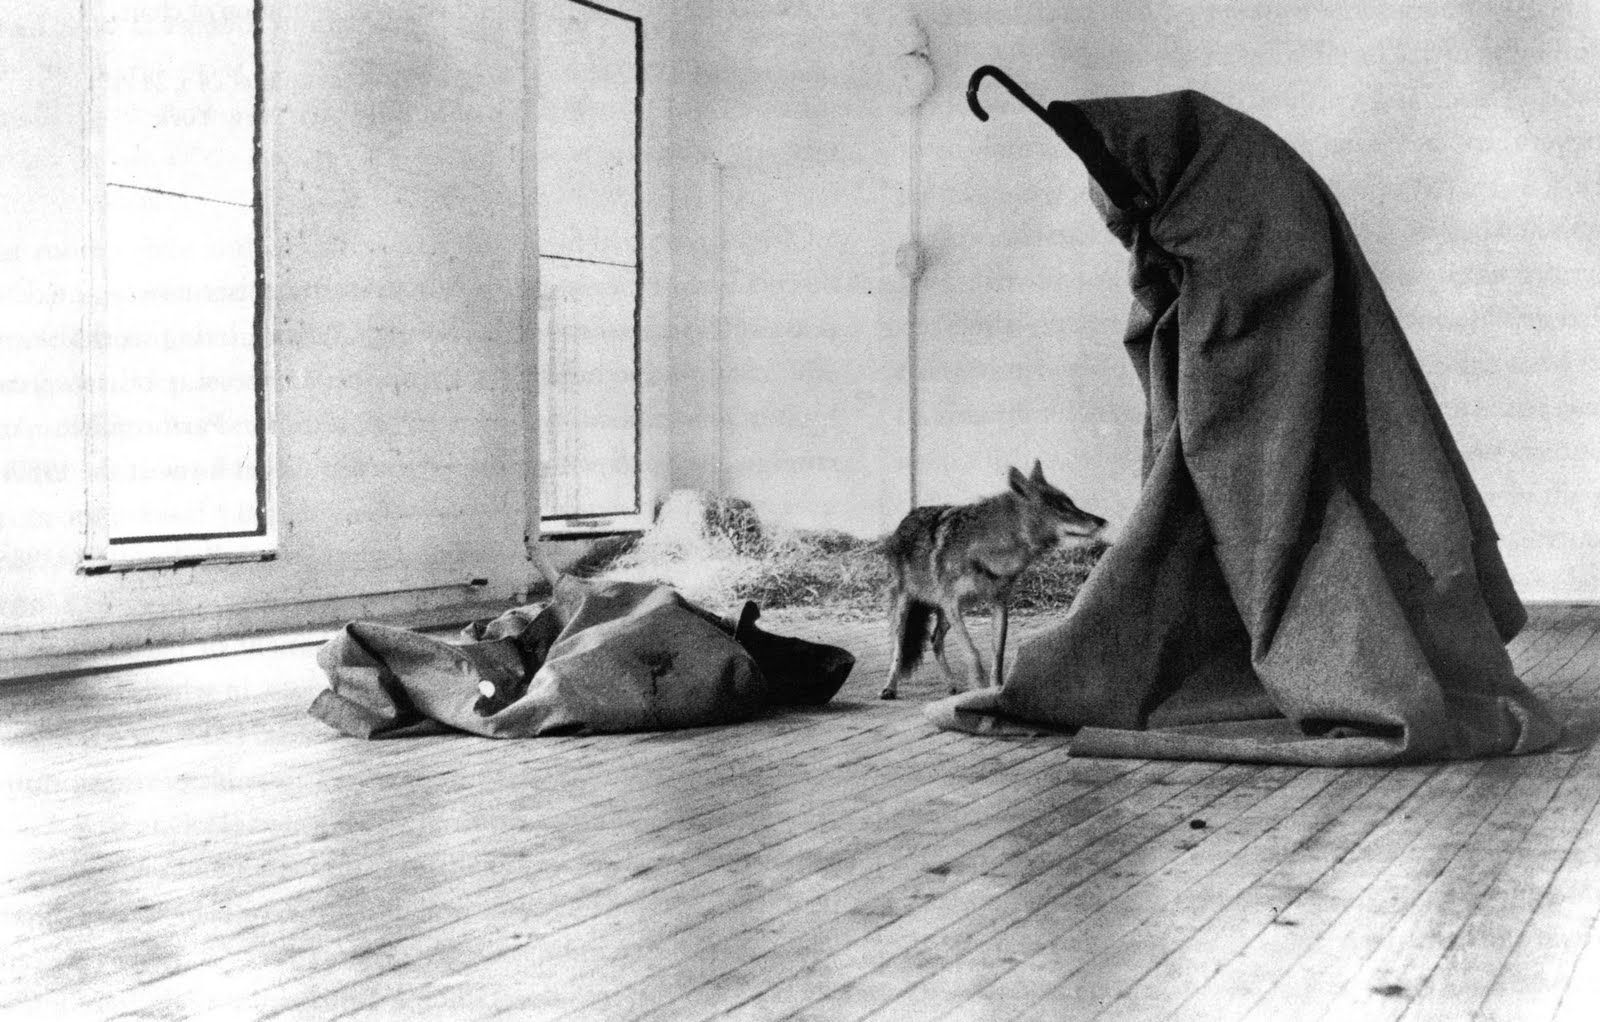 joseph beuys coyote joseph beuys pinterest k nstler kunst und skulpturen. Black Bedroom Furniture Sets. Home Design Ideas